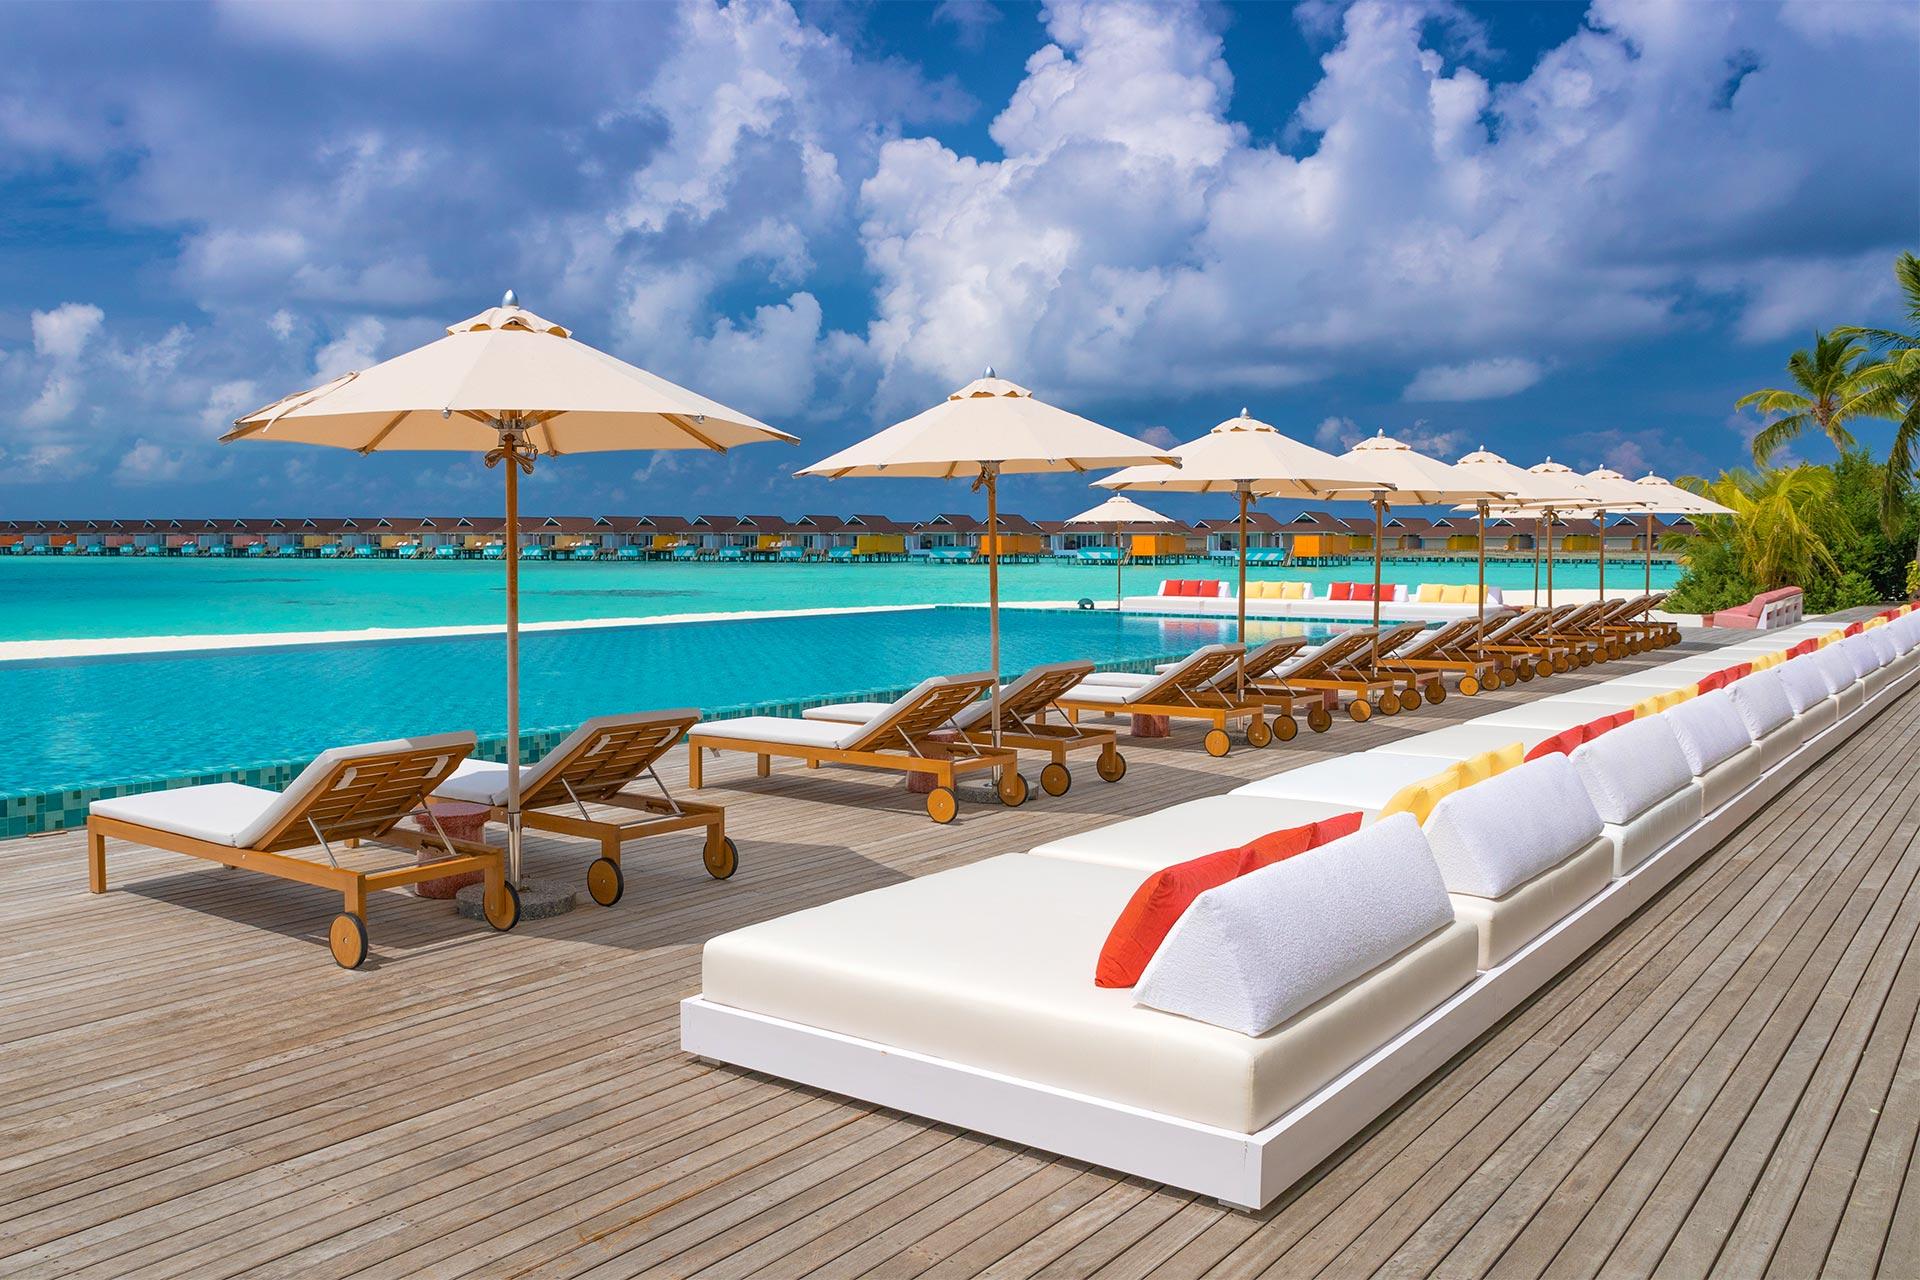 Luna de miere - Sejur plaja The Standard Huruvalhi Maldives, 8 zile